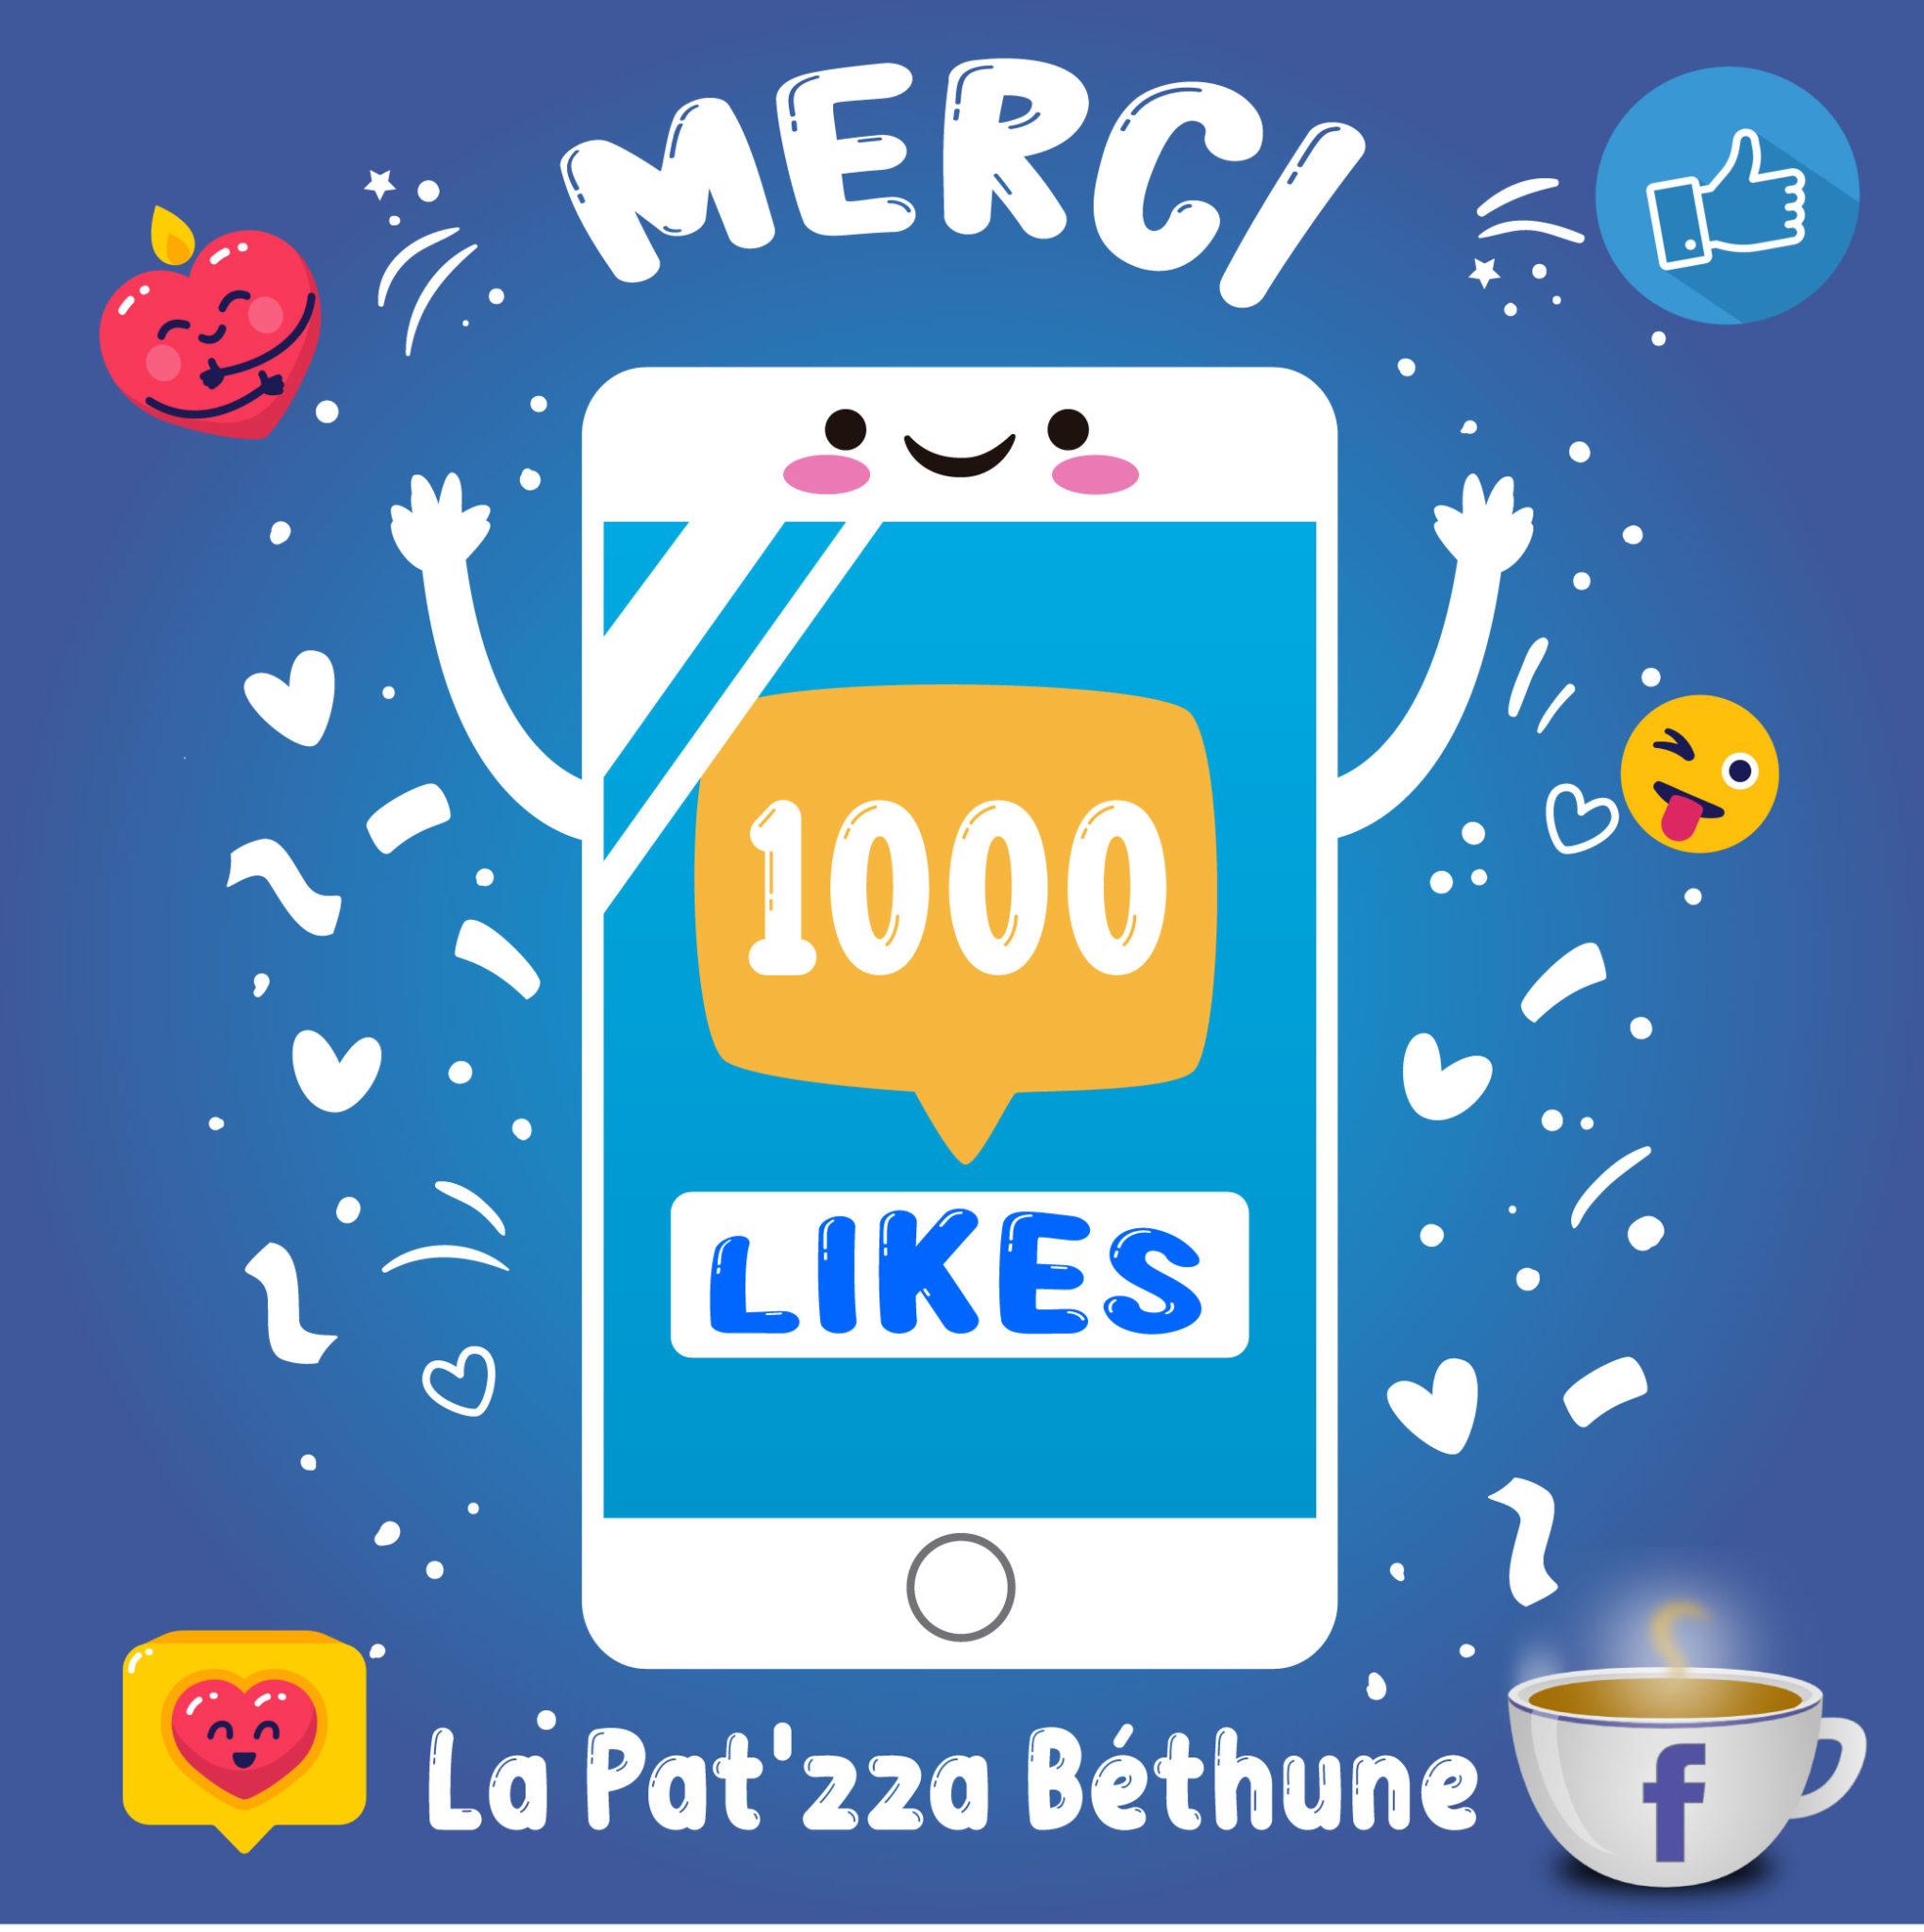 Merci 1000 Likes La Pt'zza